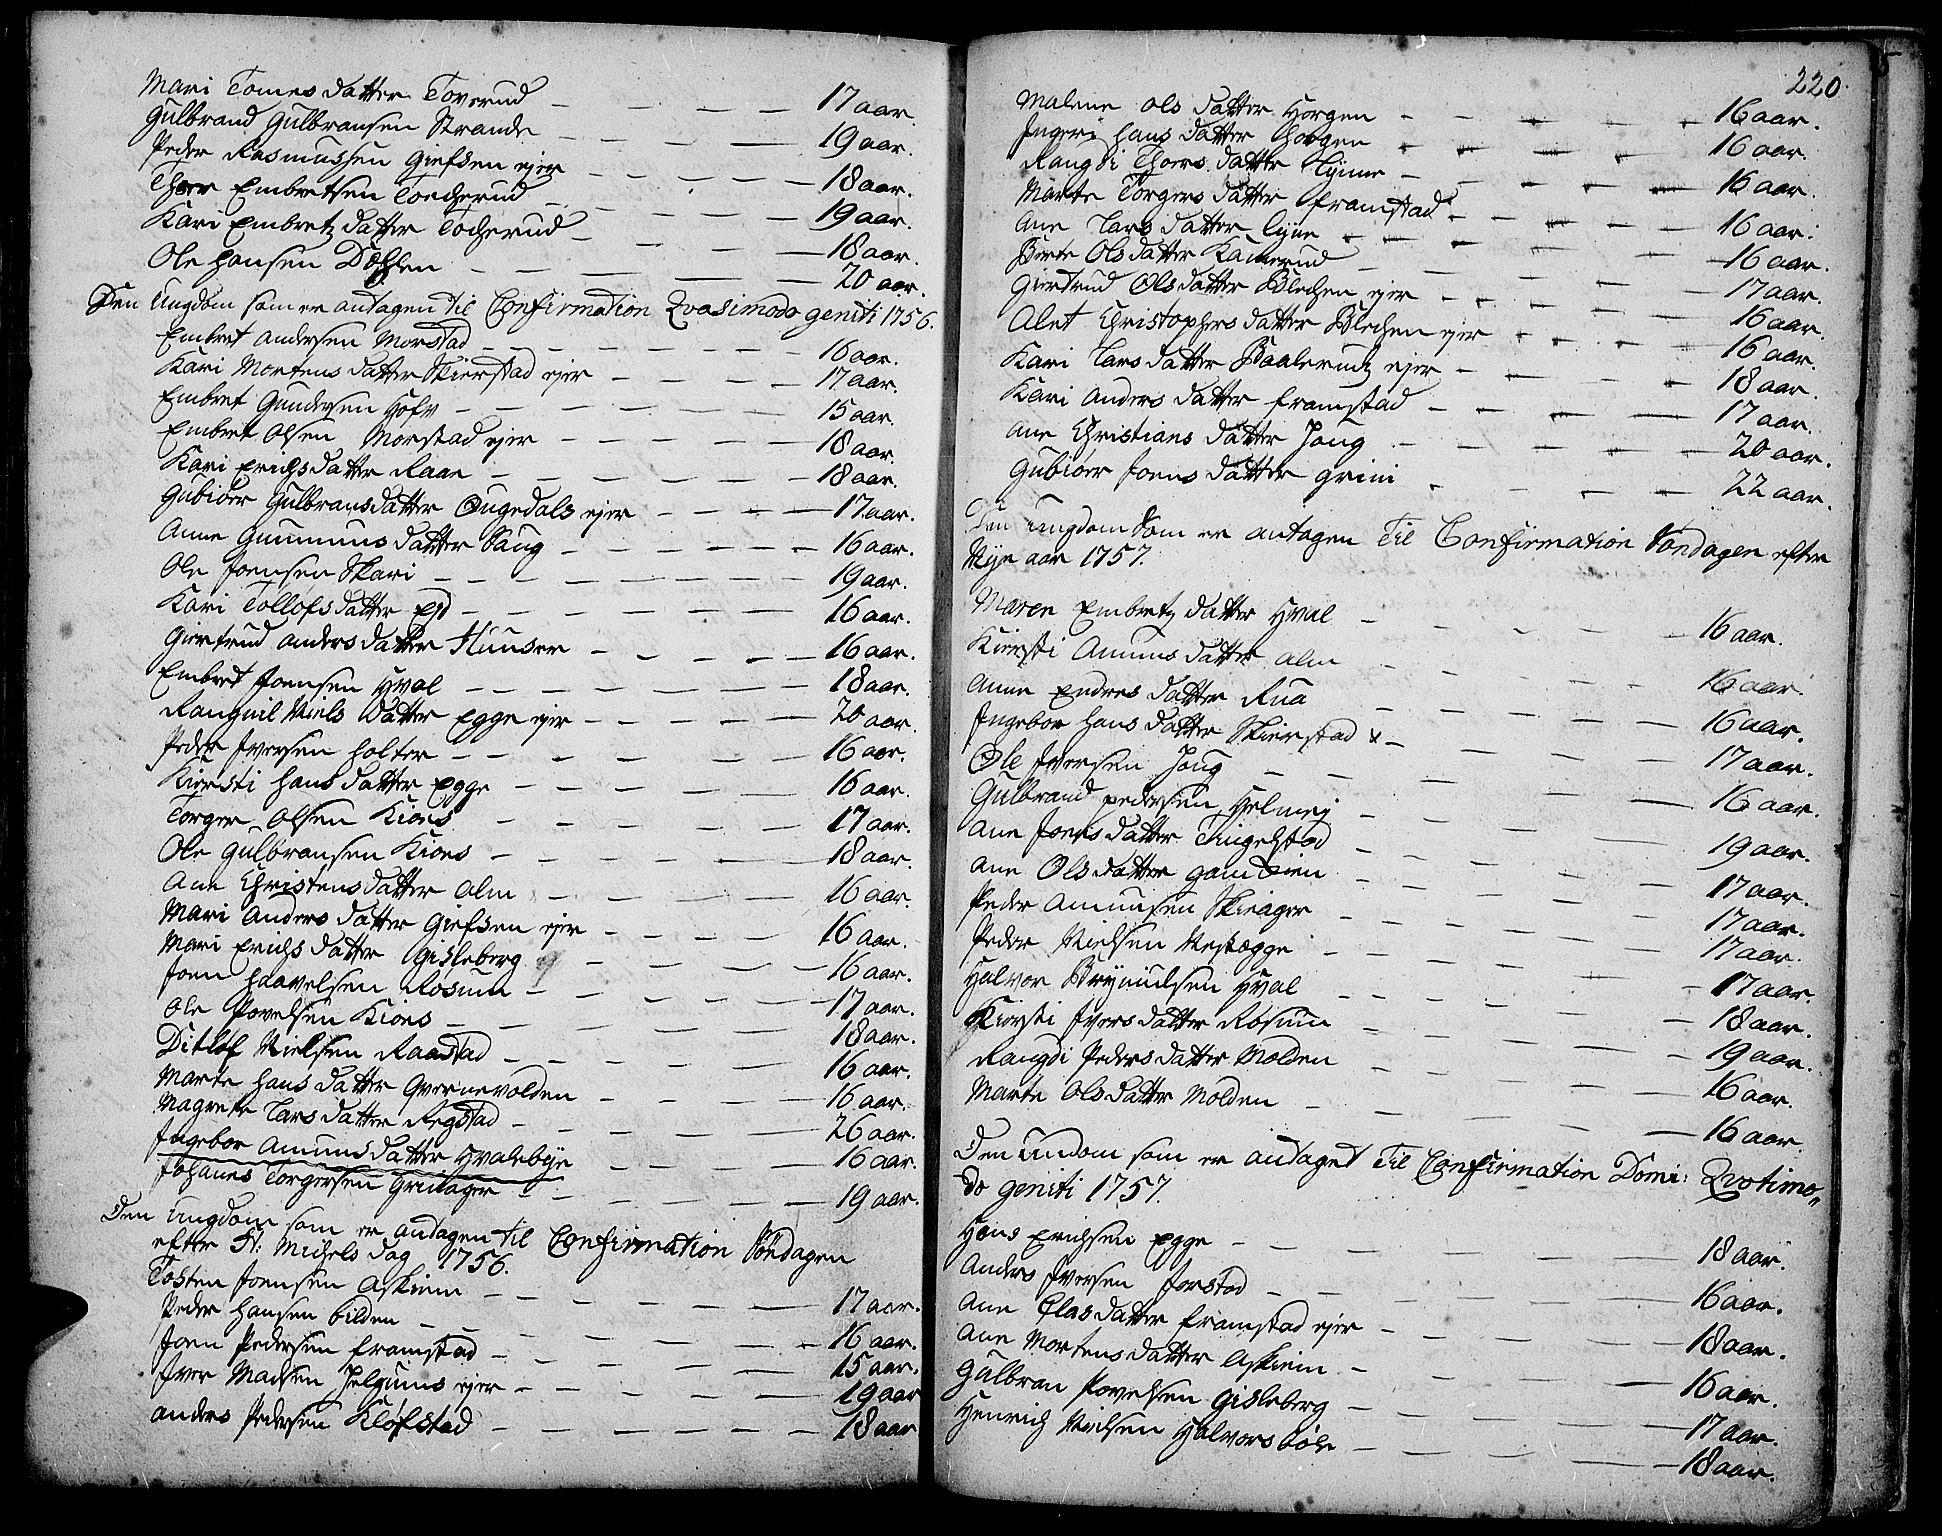 SAH, Gran prestekontor, Ministerialbok nr. 3, 1745-1758, s. 220